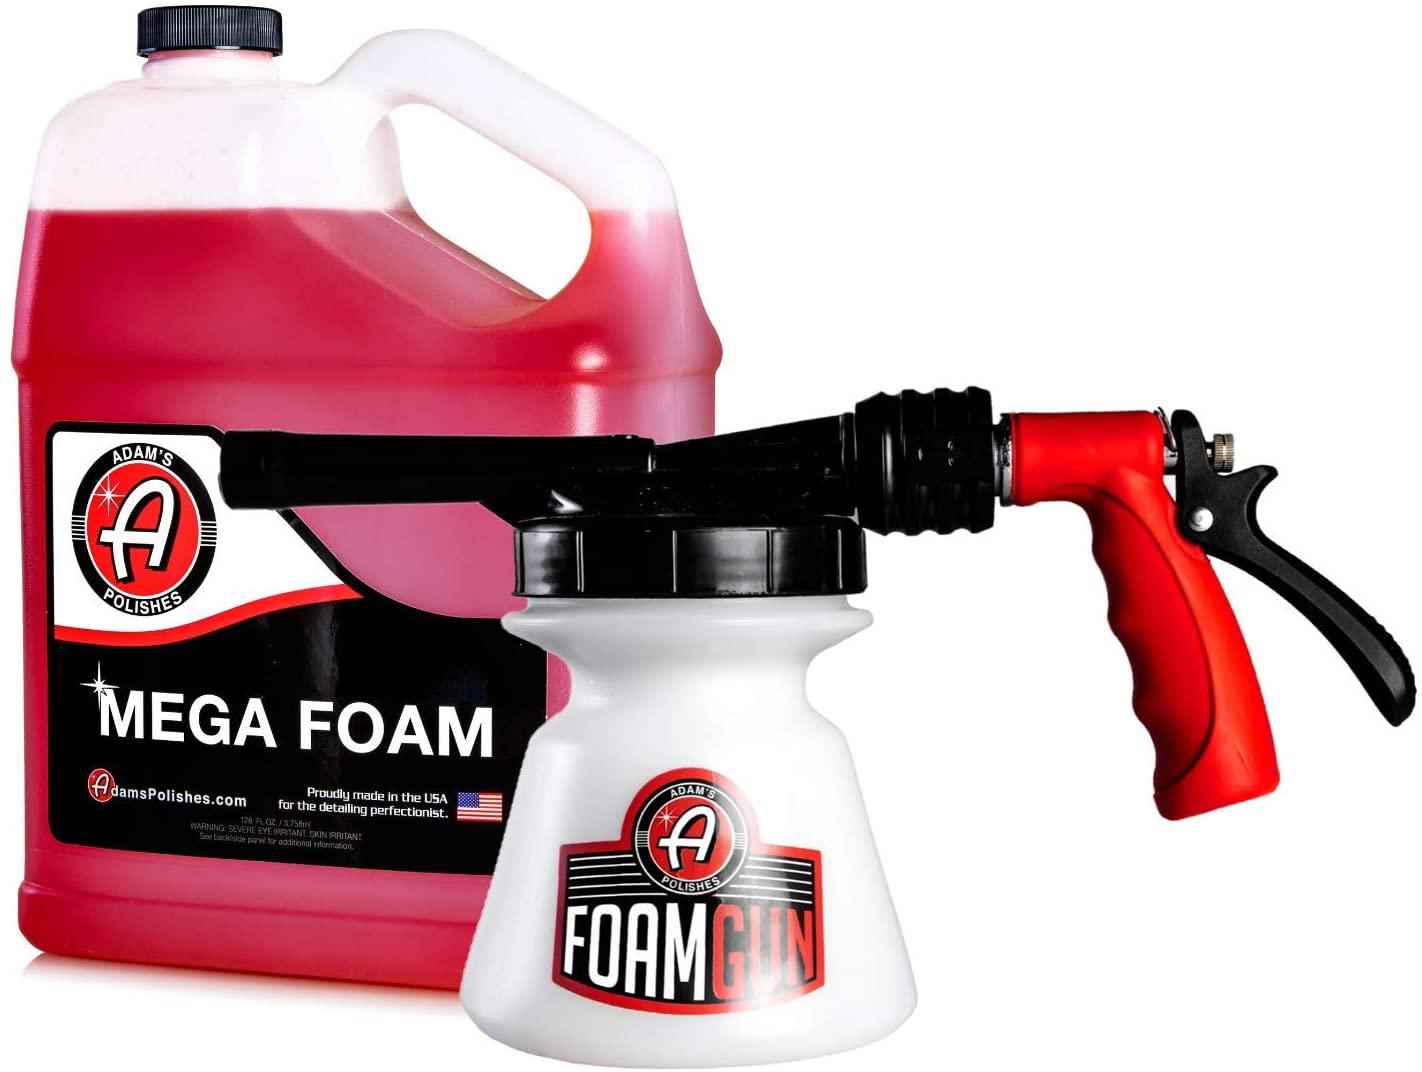 foam gun hose attachments them wash pick mega luxury